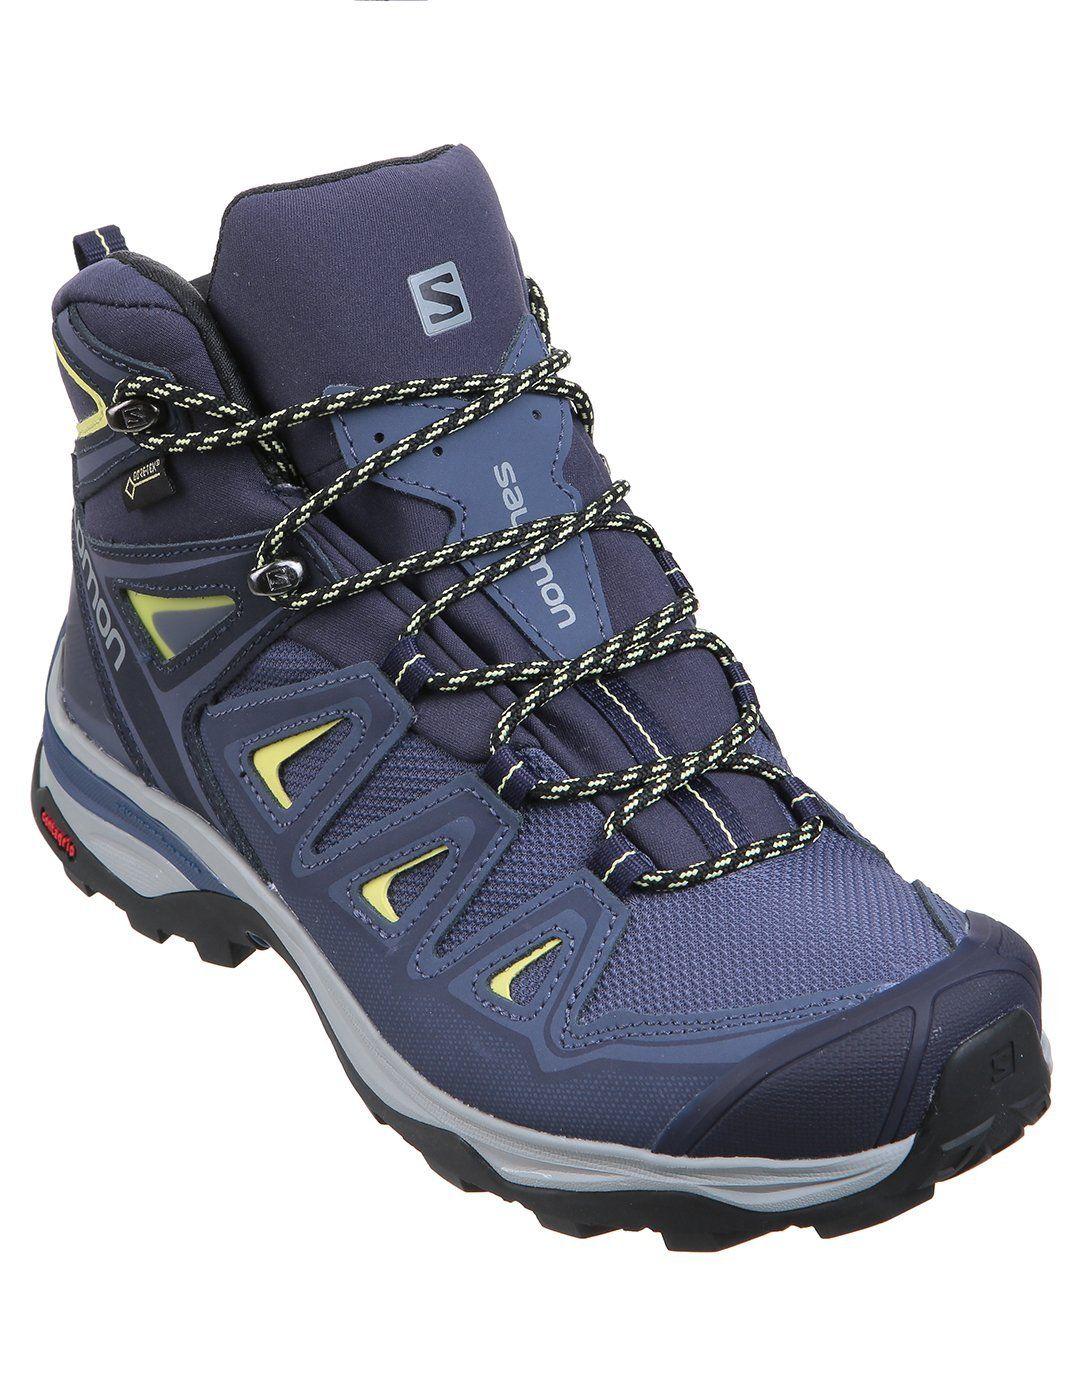 Salomon X Ultra 3 Mid Gtx Hiking Boots Women S Rei Co Op Hiking Boots Women Womens Boots Hiking Boots